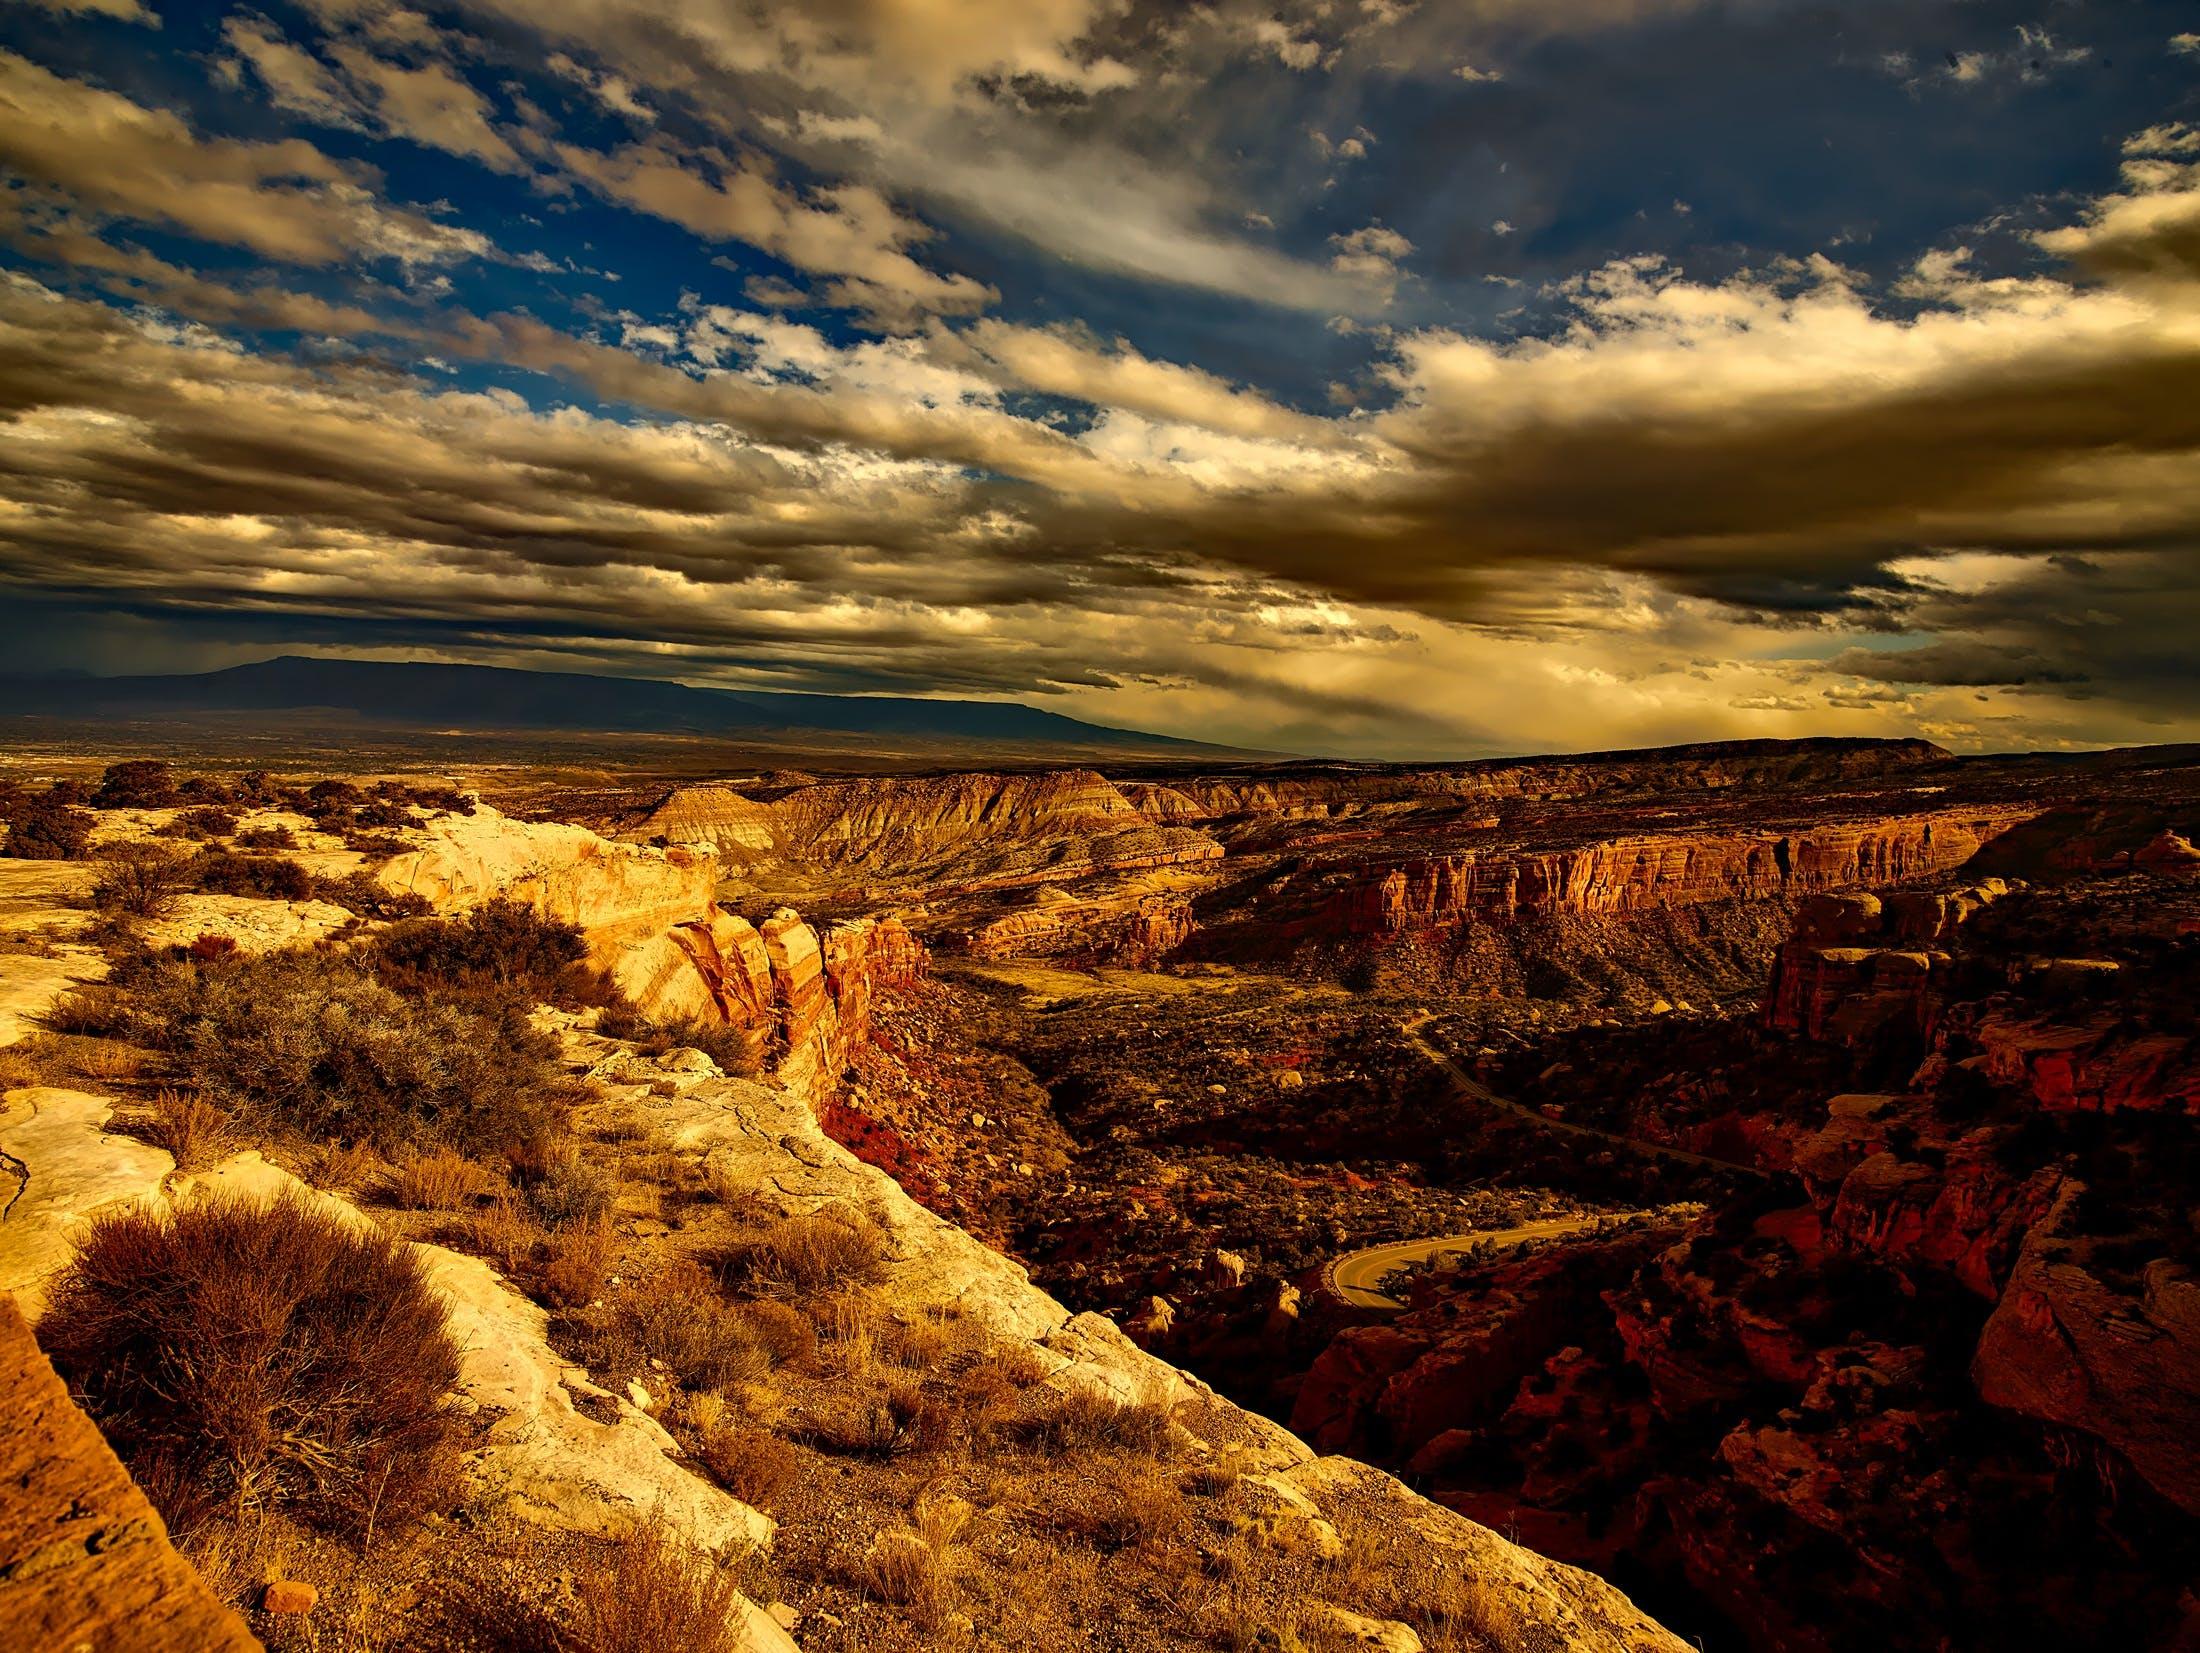 alba, barranc, Canyon